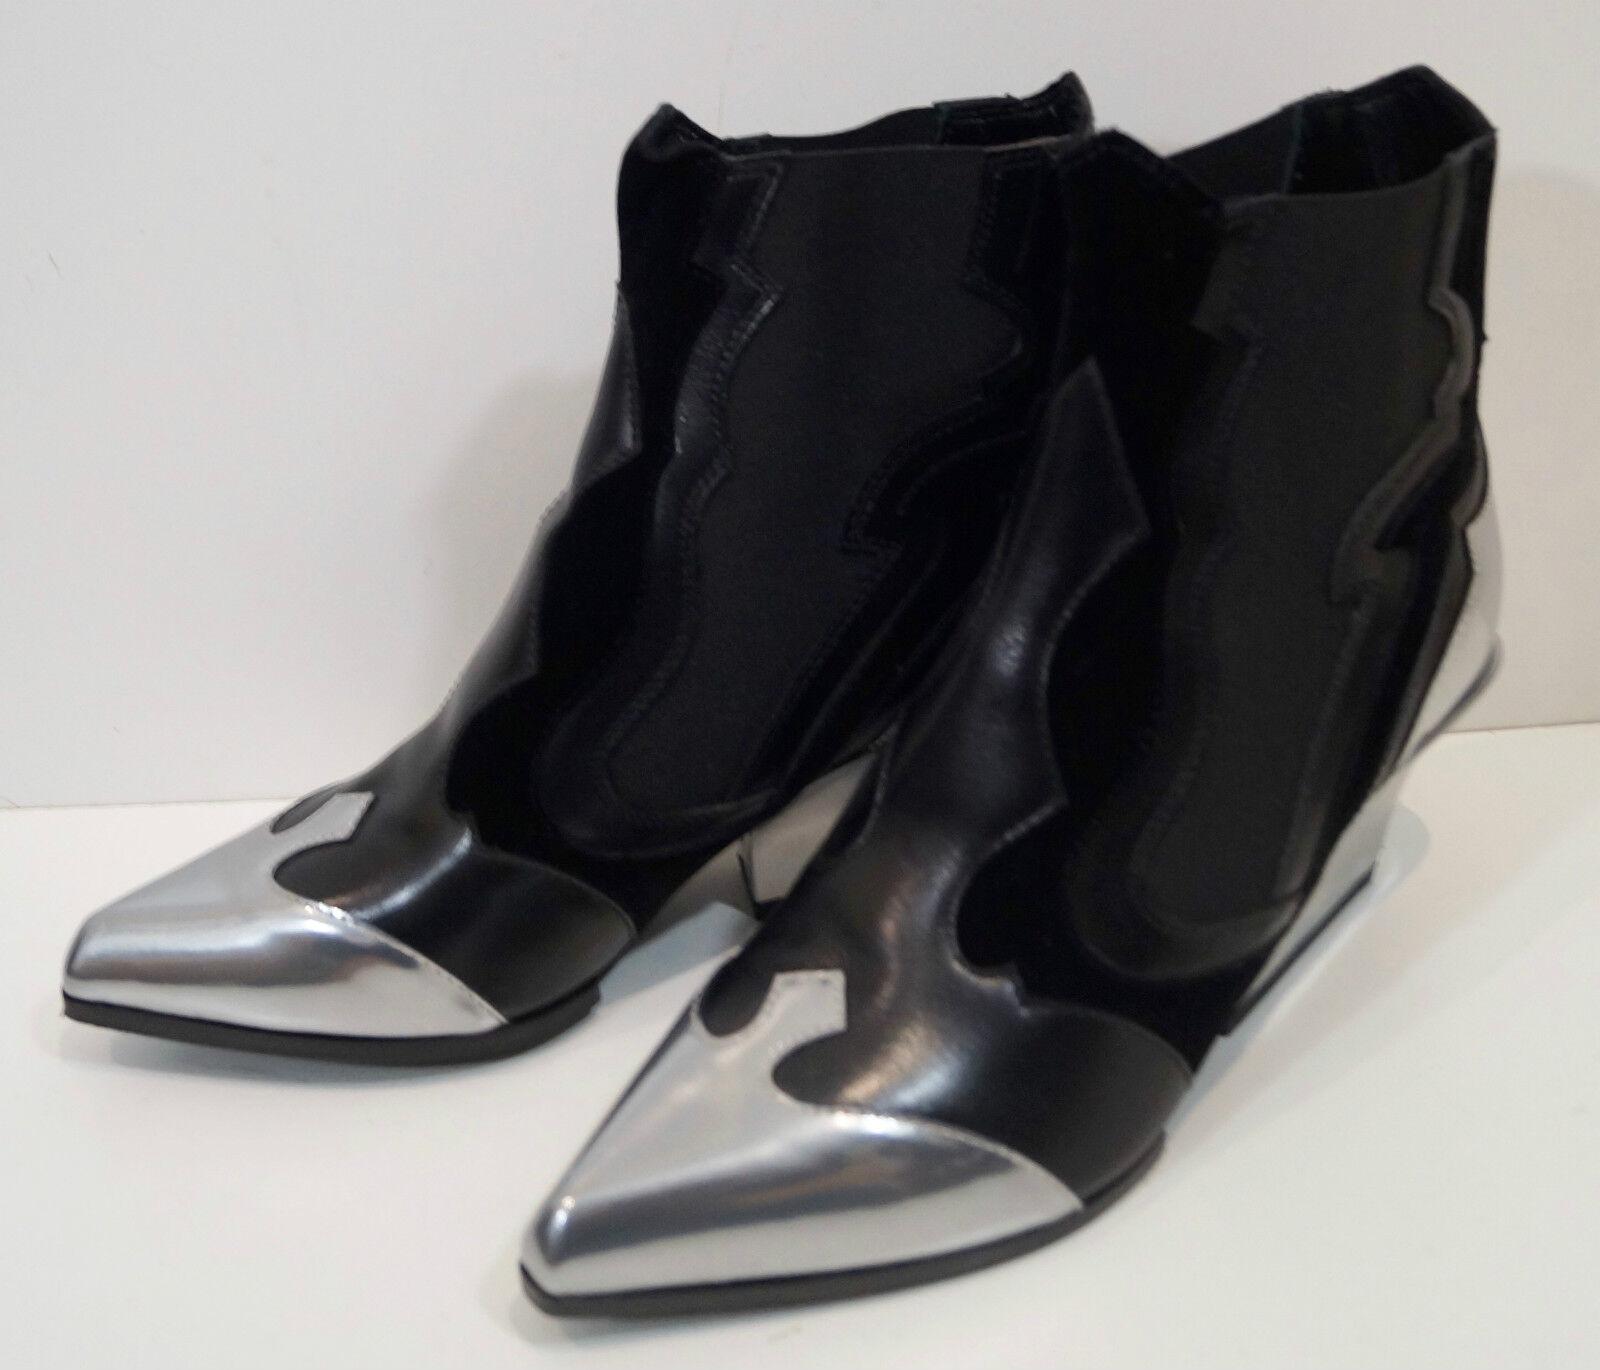 Christian Louboutin Zapato de barco Párrafo corto